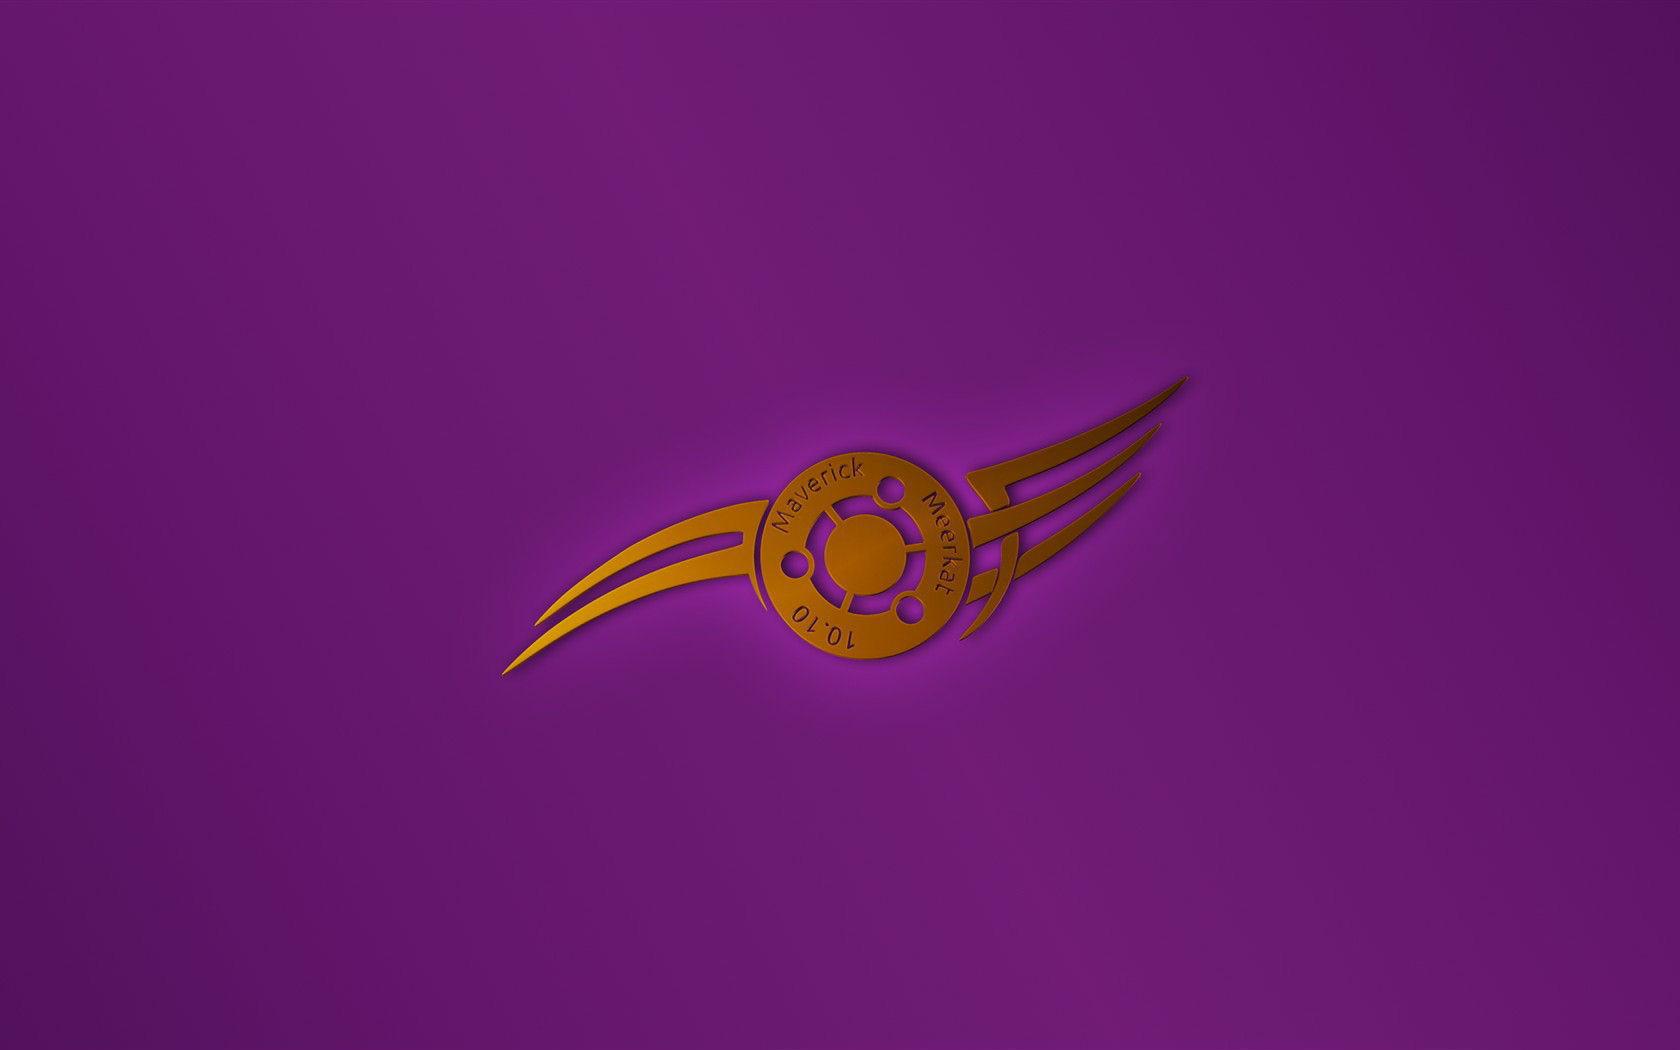 Screensaver ubuntu, pink, background, logo, maverick, meerket